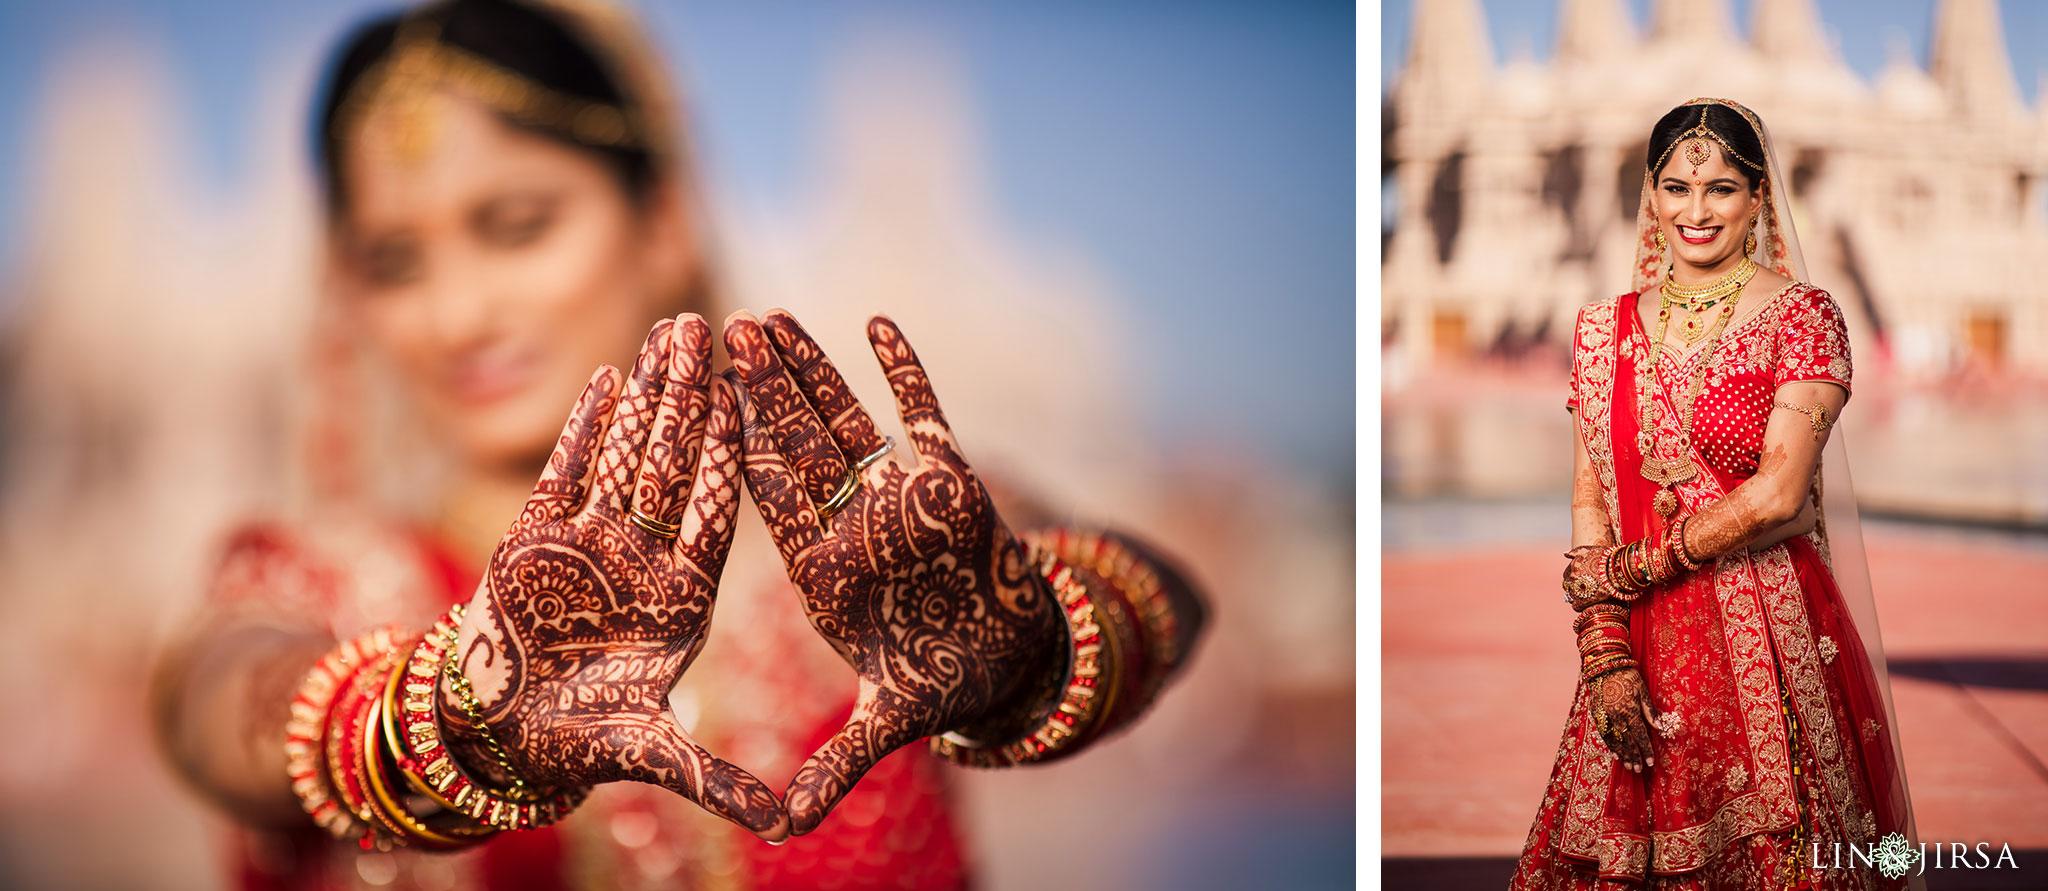 066 BAPS Swaminarayan Sanstha Chino Hills Indian Wedding Photography